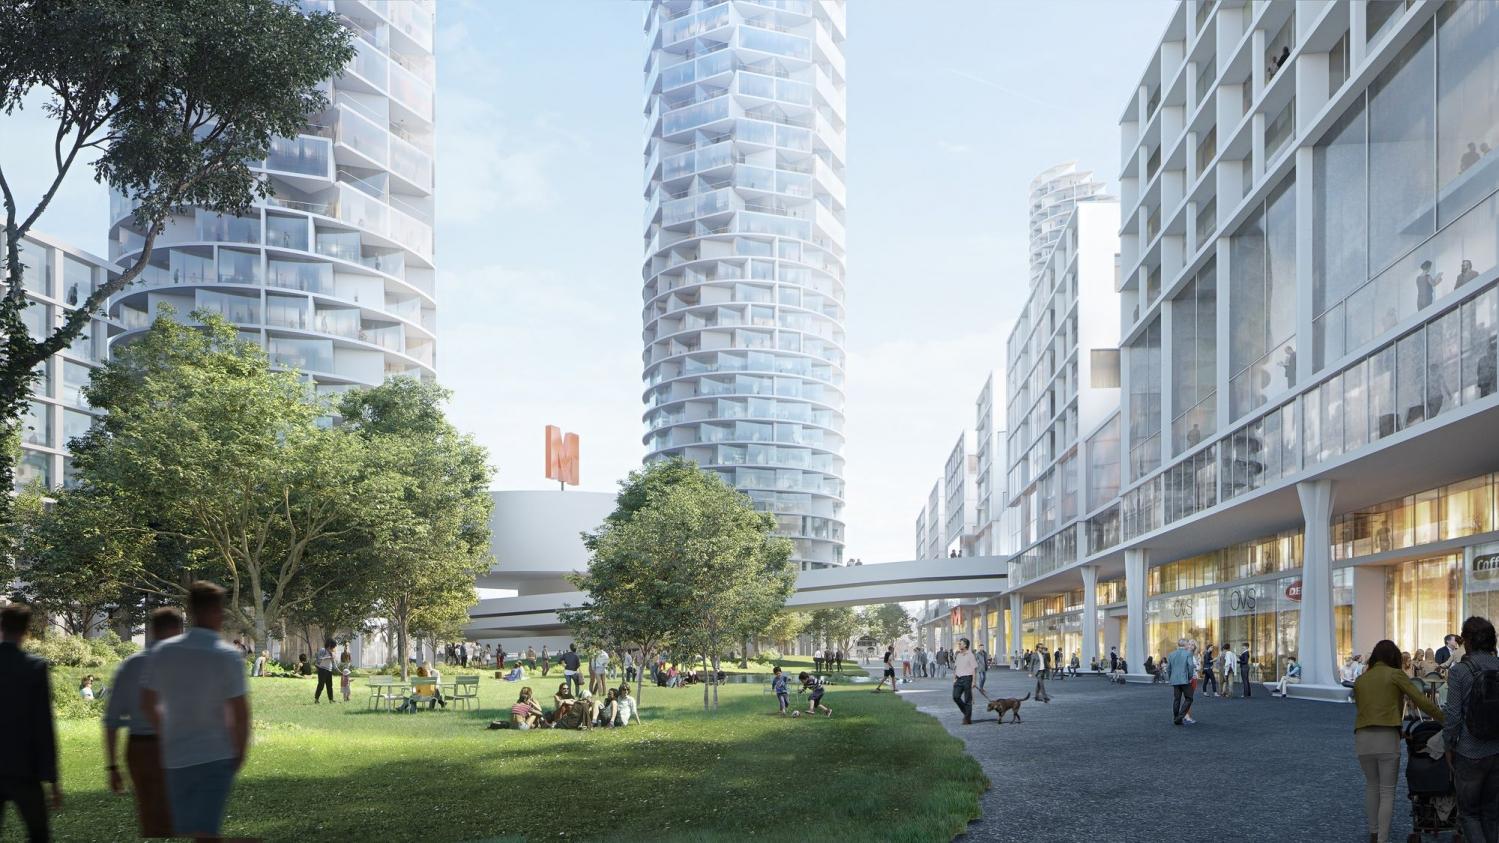 Herzog-de-Meuron-.-Nordspitze-new-master-plan-.-Basel-4.jpg